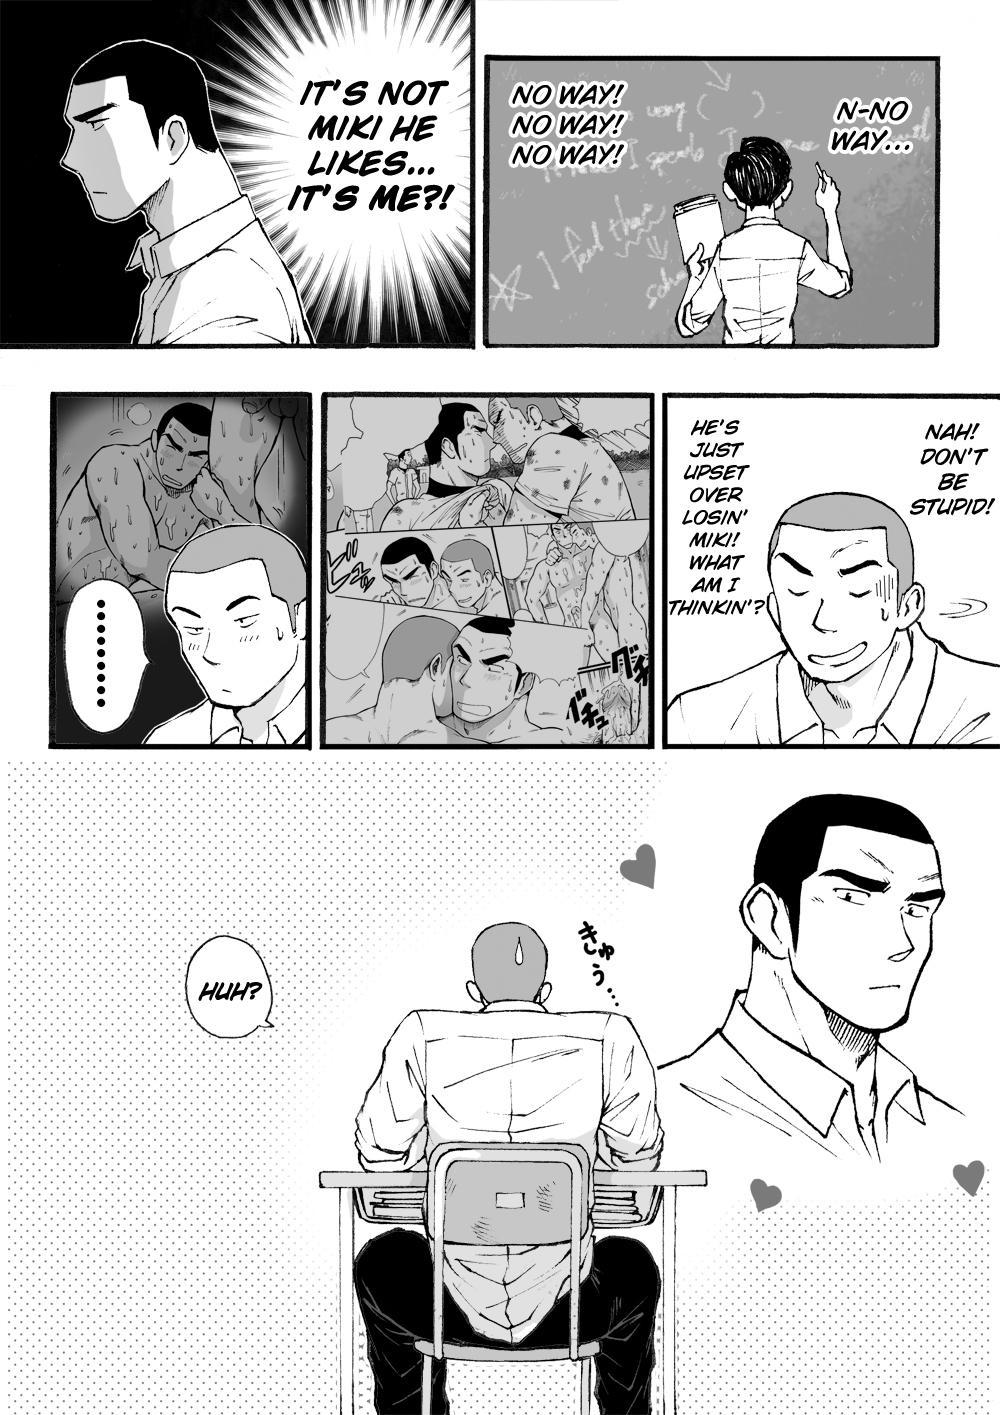 [Akahachi] Motemote Yakyuubu Otoko [Kouhen] | Popular Baseball Club Boys (Part Two) [English] [Papatez] 4